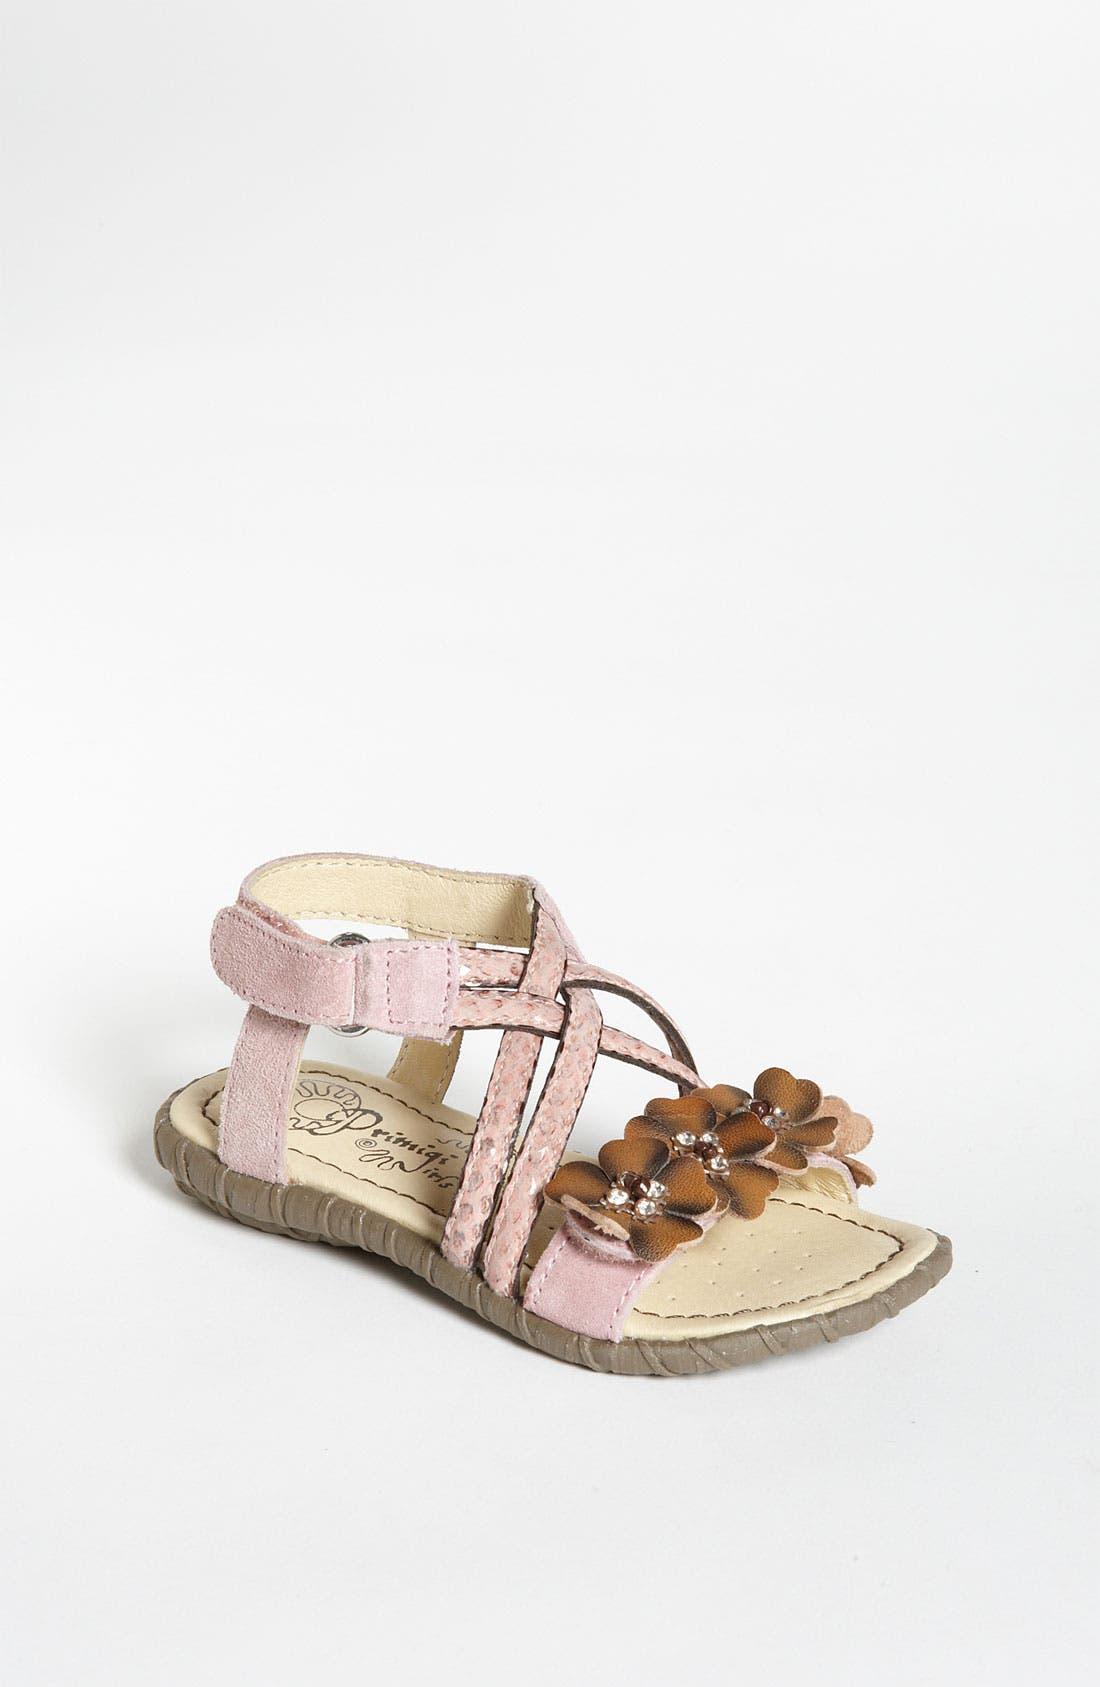 Alternate Image 1 Selected - Primigi 'Genesia' Sandal (Toddler)